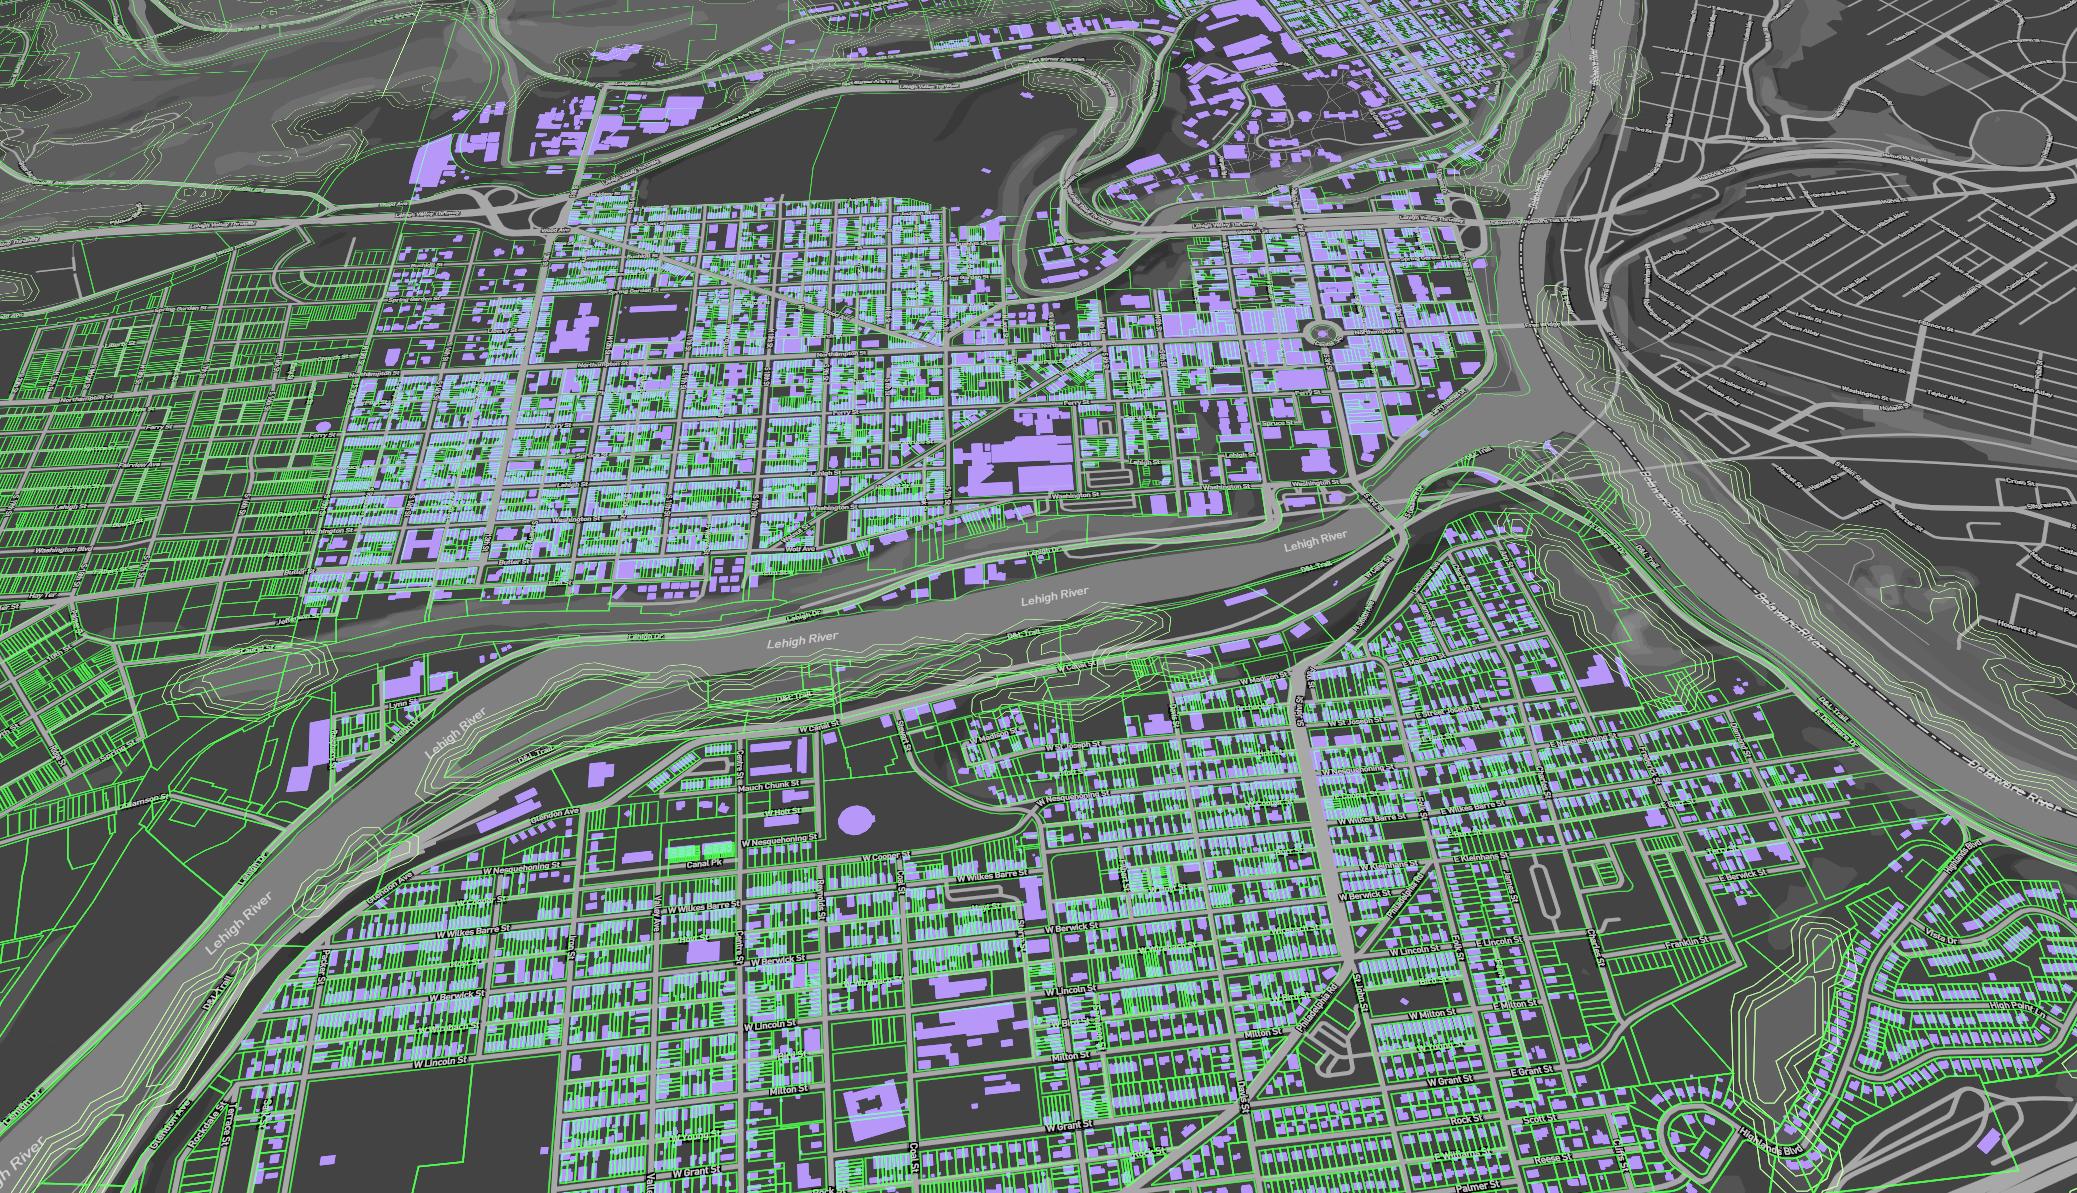 Mapbox Screen Shot 2015-12-28 at 9.02.31 AM copy.png